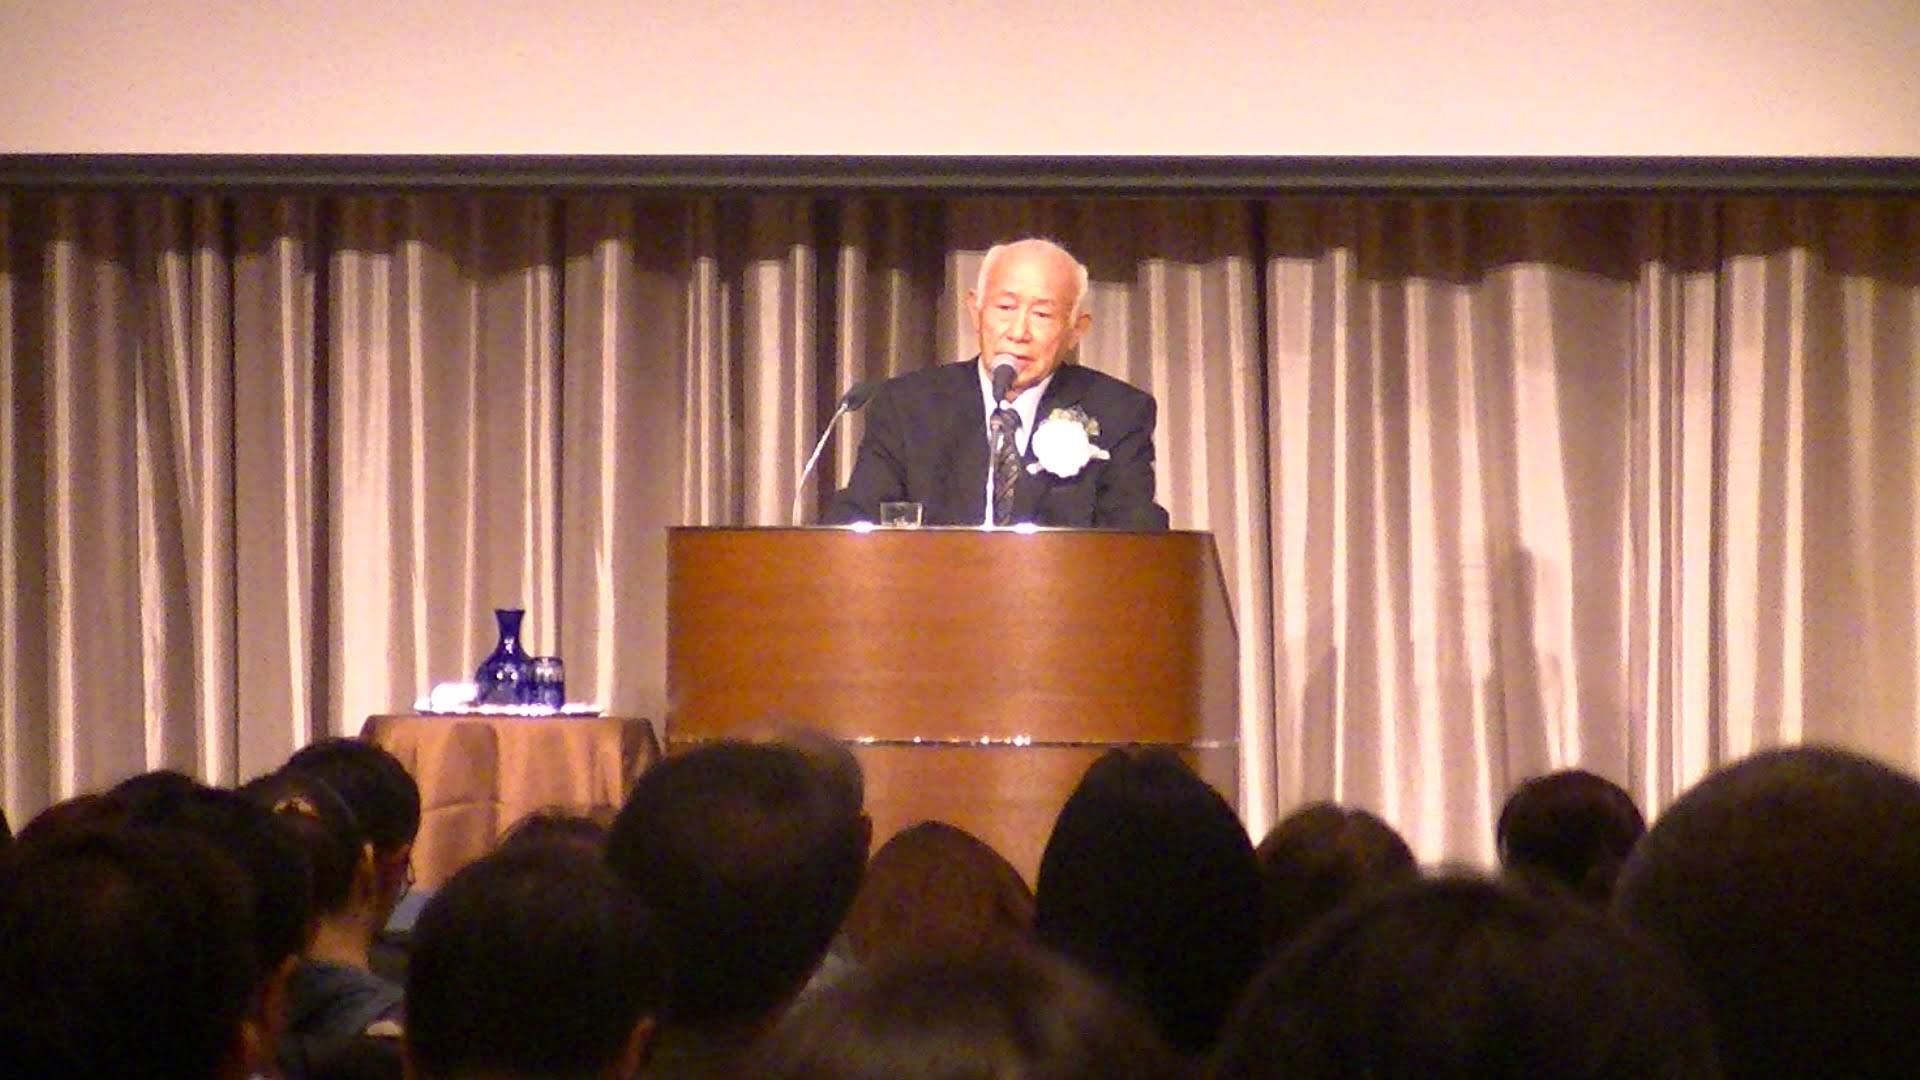 PIC 1721 1 - 思風会全国大会in広島